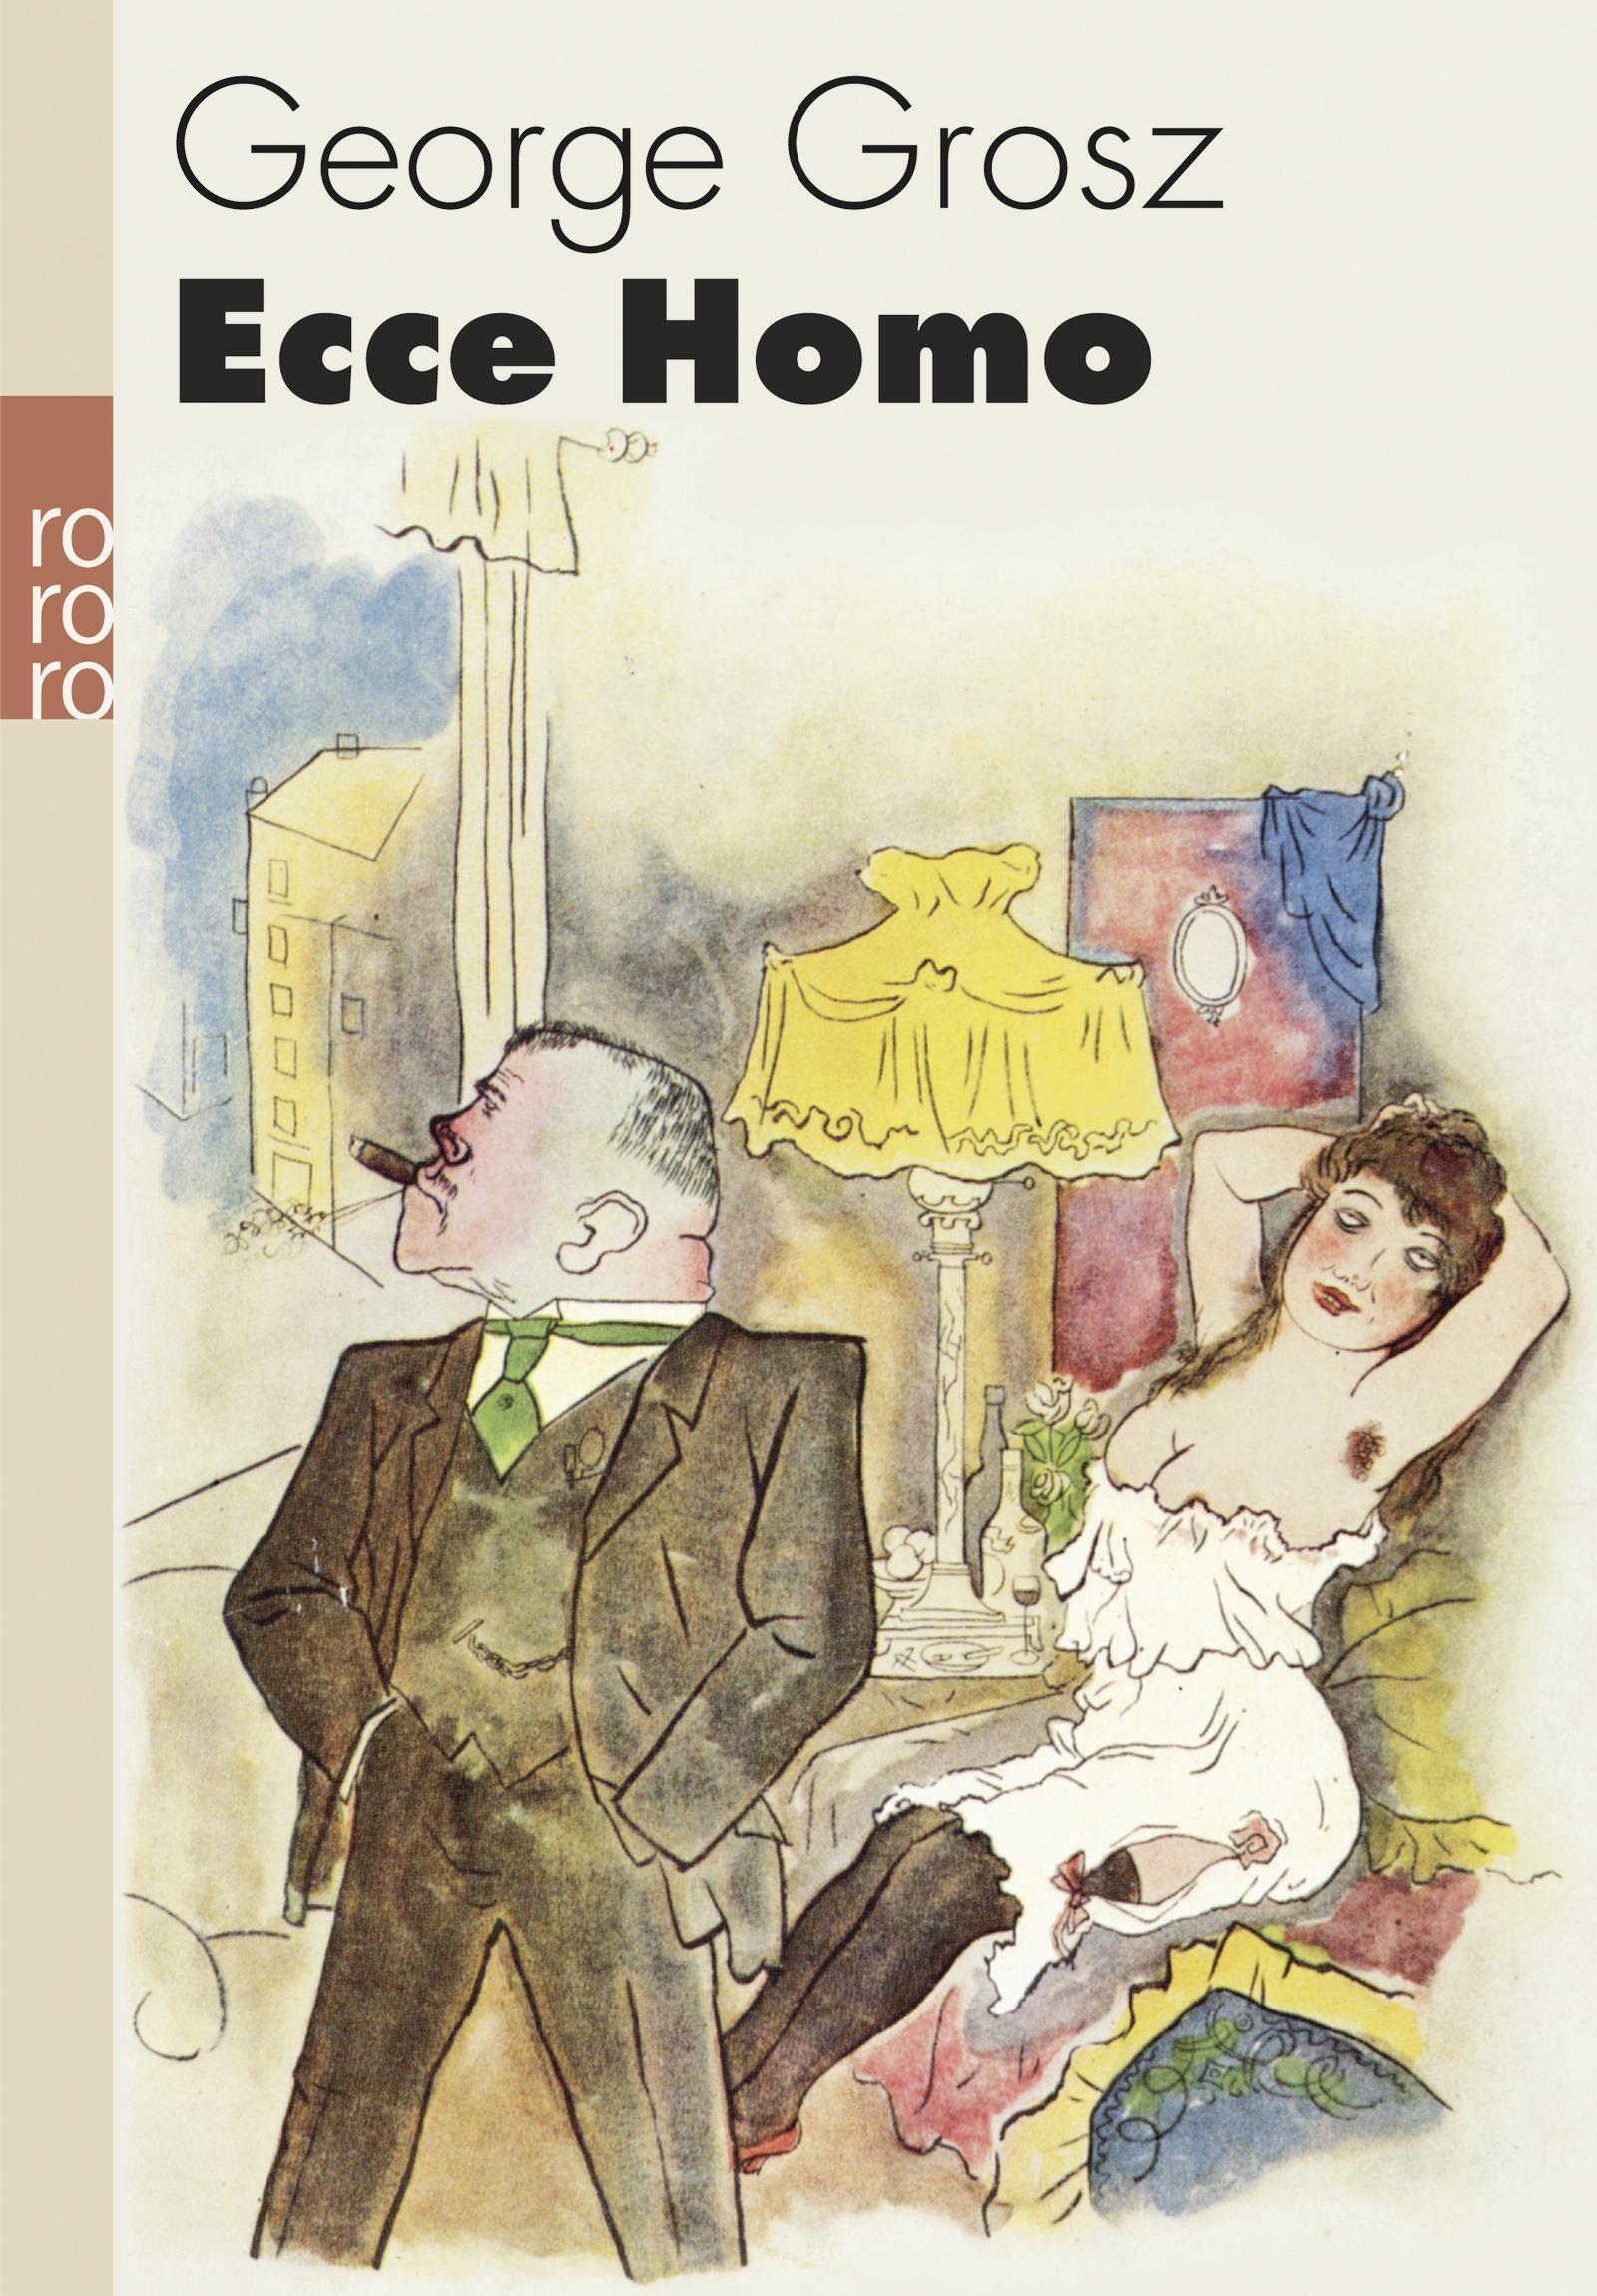 Ecce Homo, George Grosz